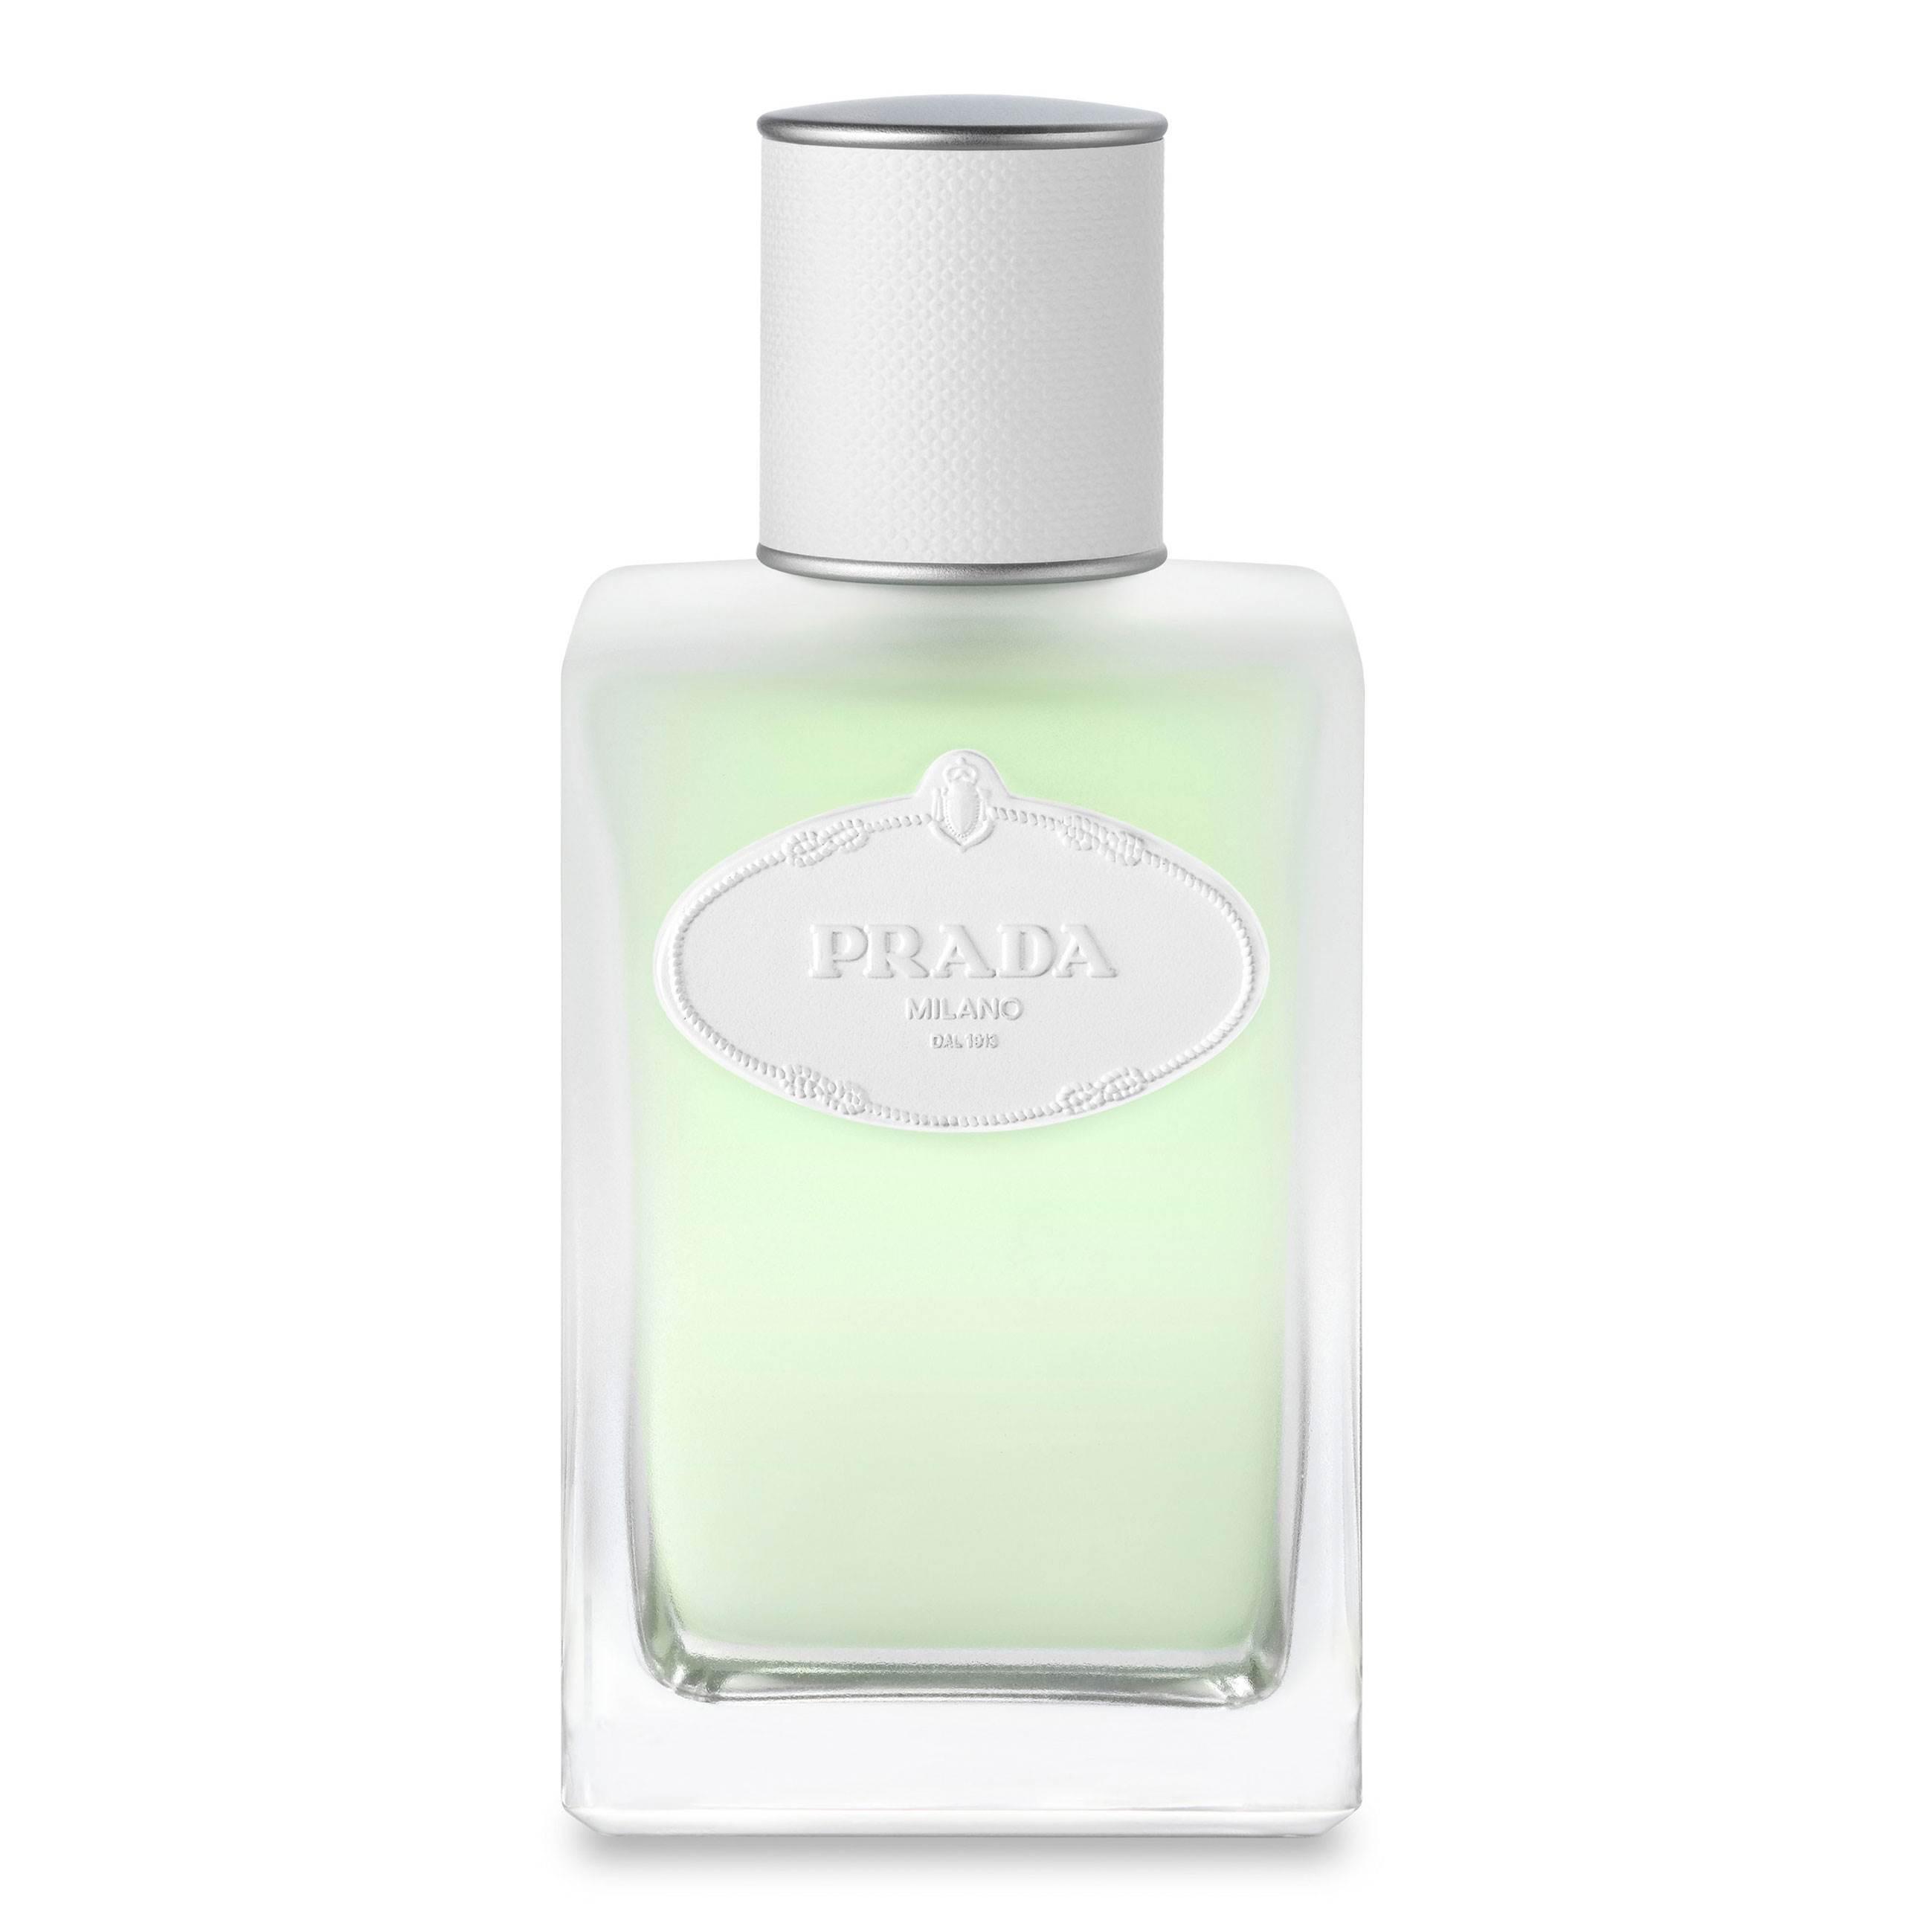 prada infusion d iris eau de toilette 50ml spray